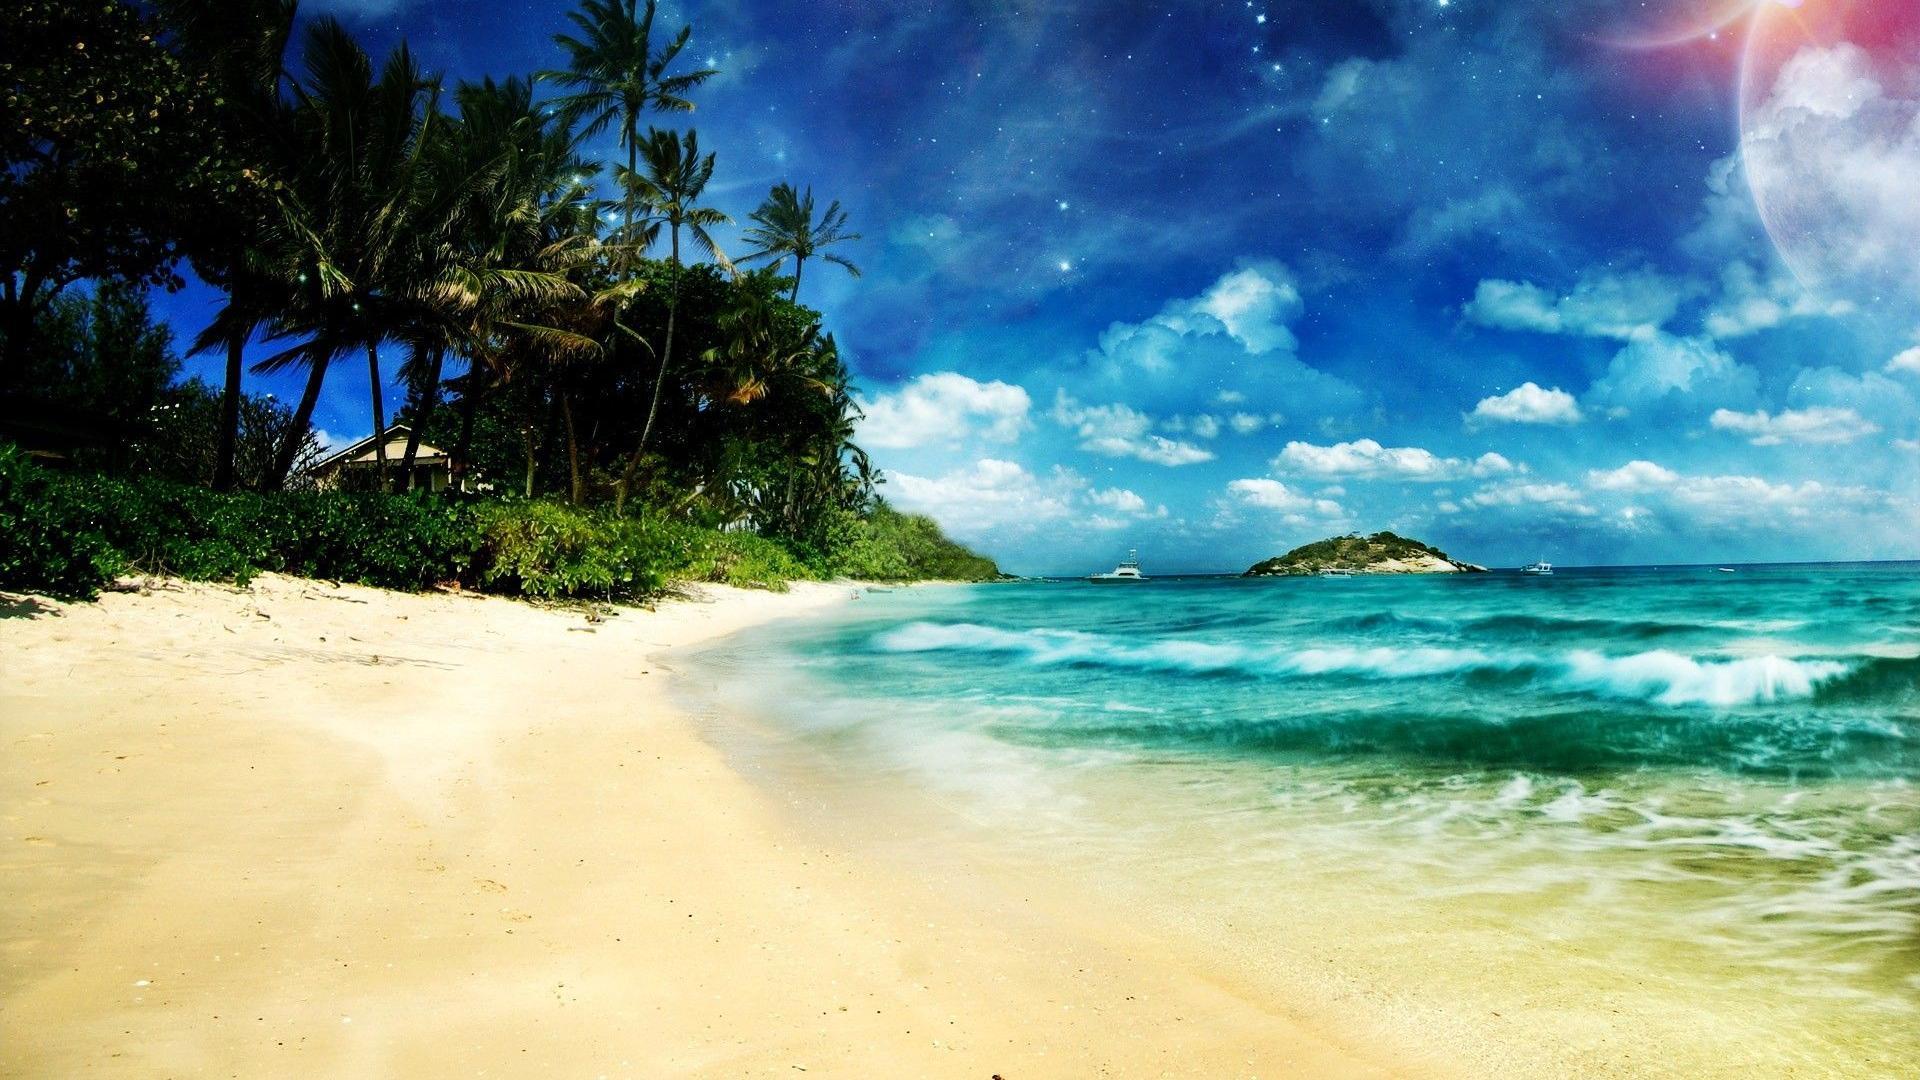 Free Download Miami Beach Wallpaper Widescreen Cool